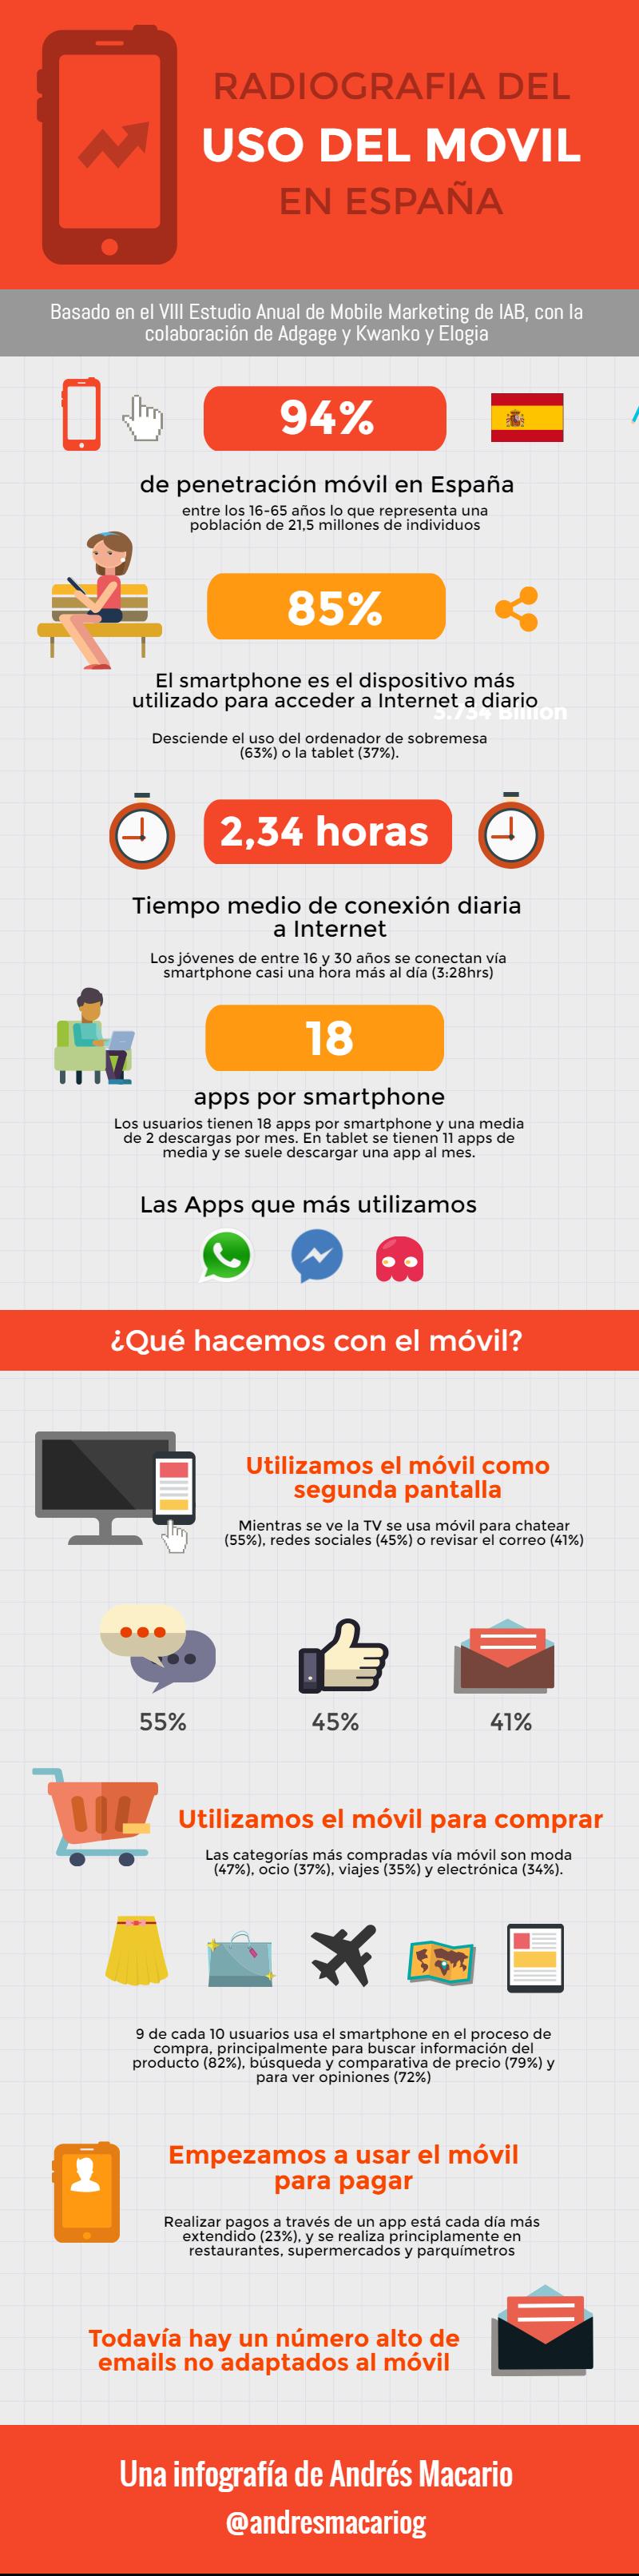 Radiografia del uso del móvil en España - Infografia Andres Macario